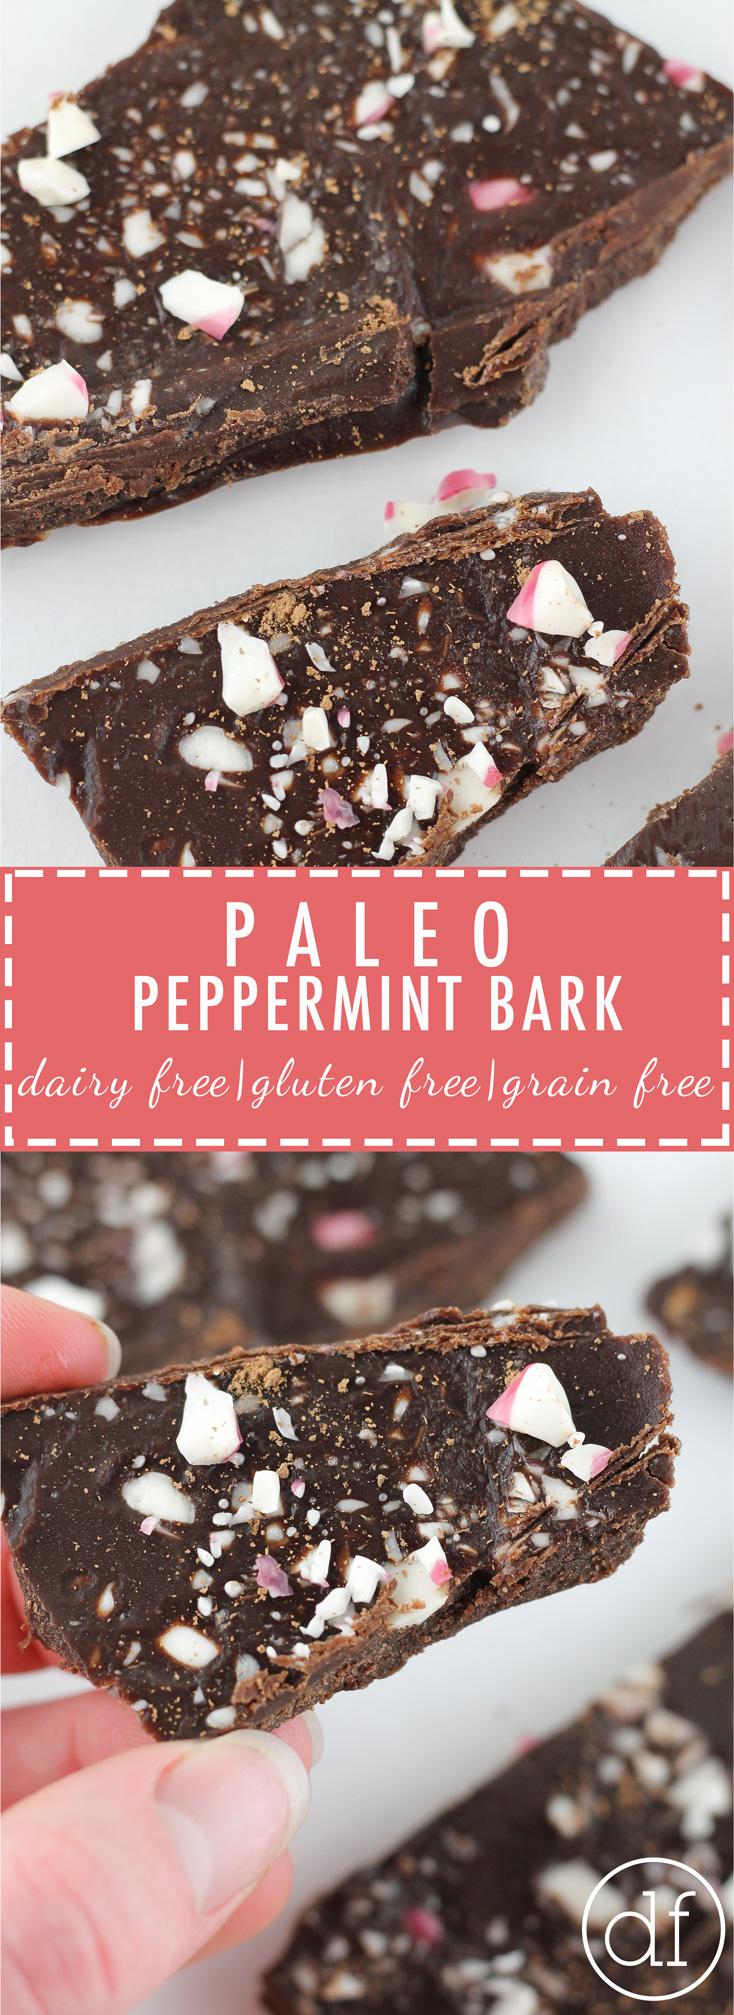 Paleo Peppermint Bark, Paleo, Grain Free, Gluten Free, Dairy Free, Paleo Christmas, Define Fettle